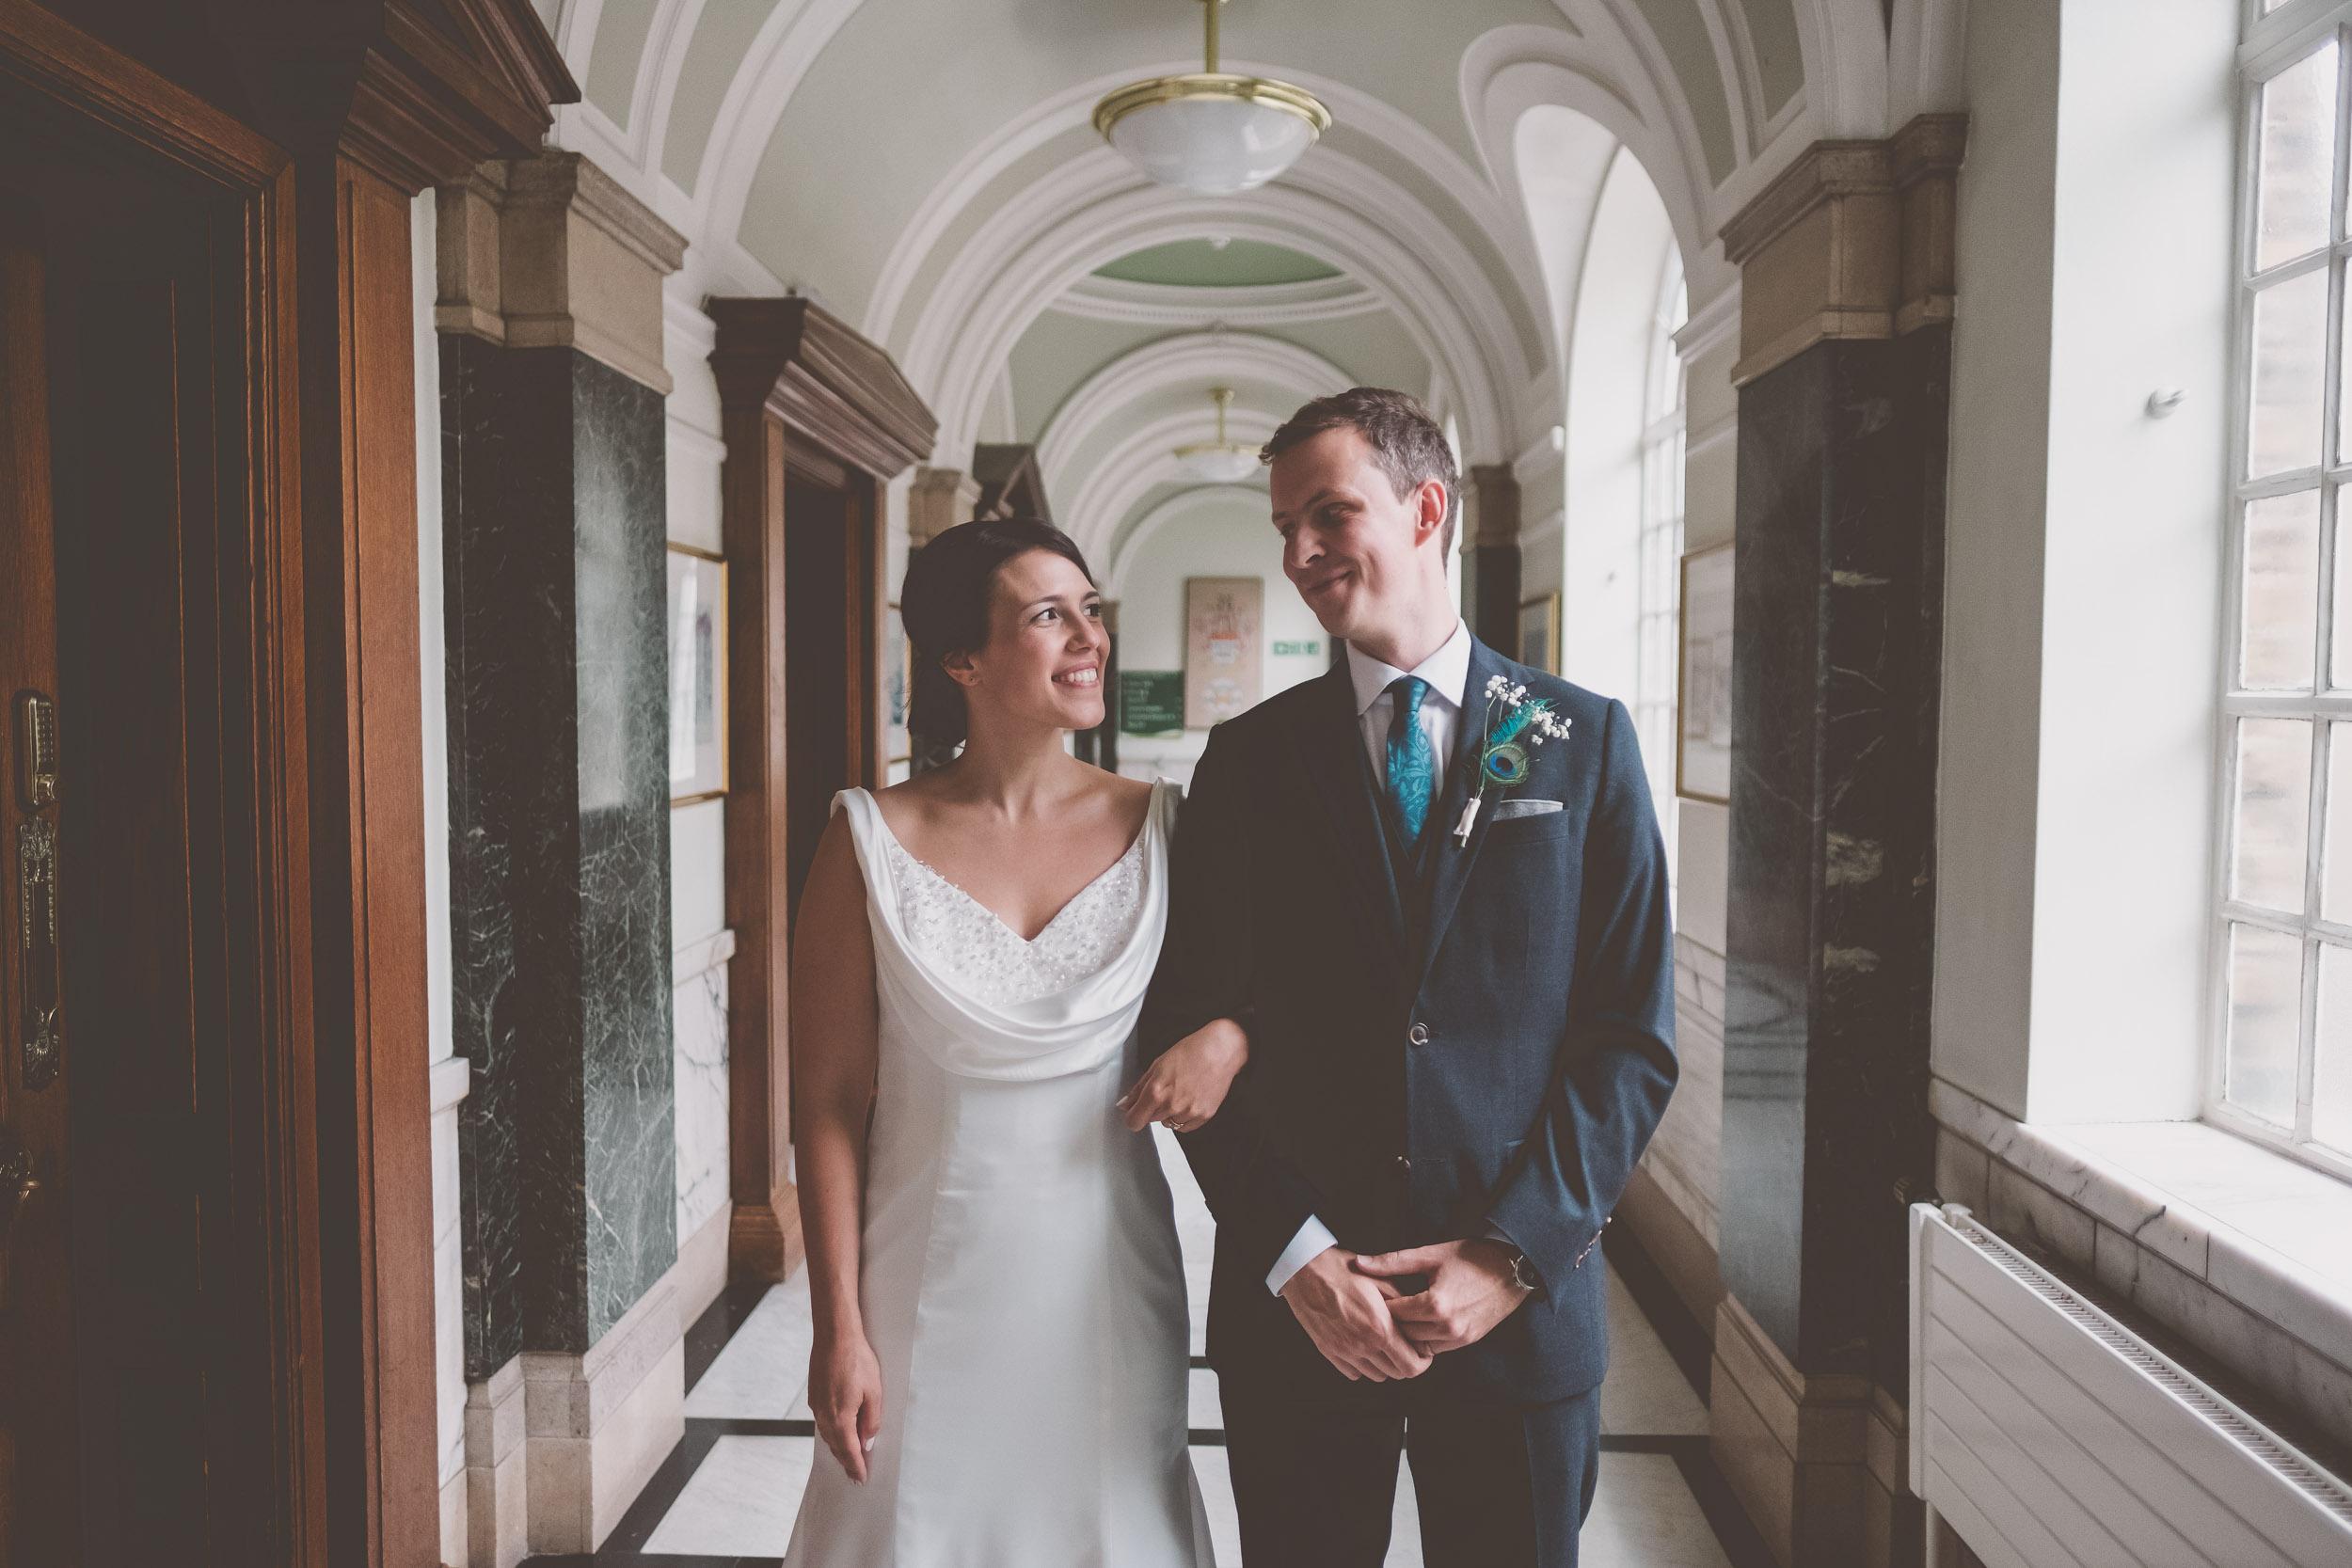 islington-town-hall-4th-floor-studios-wedding135.jpg